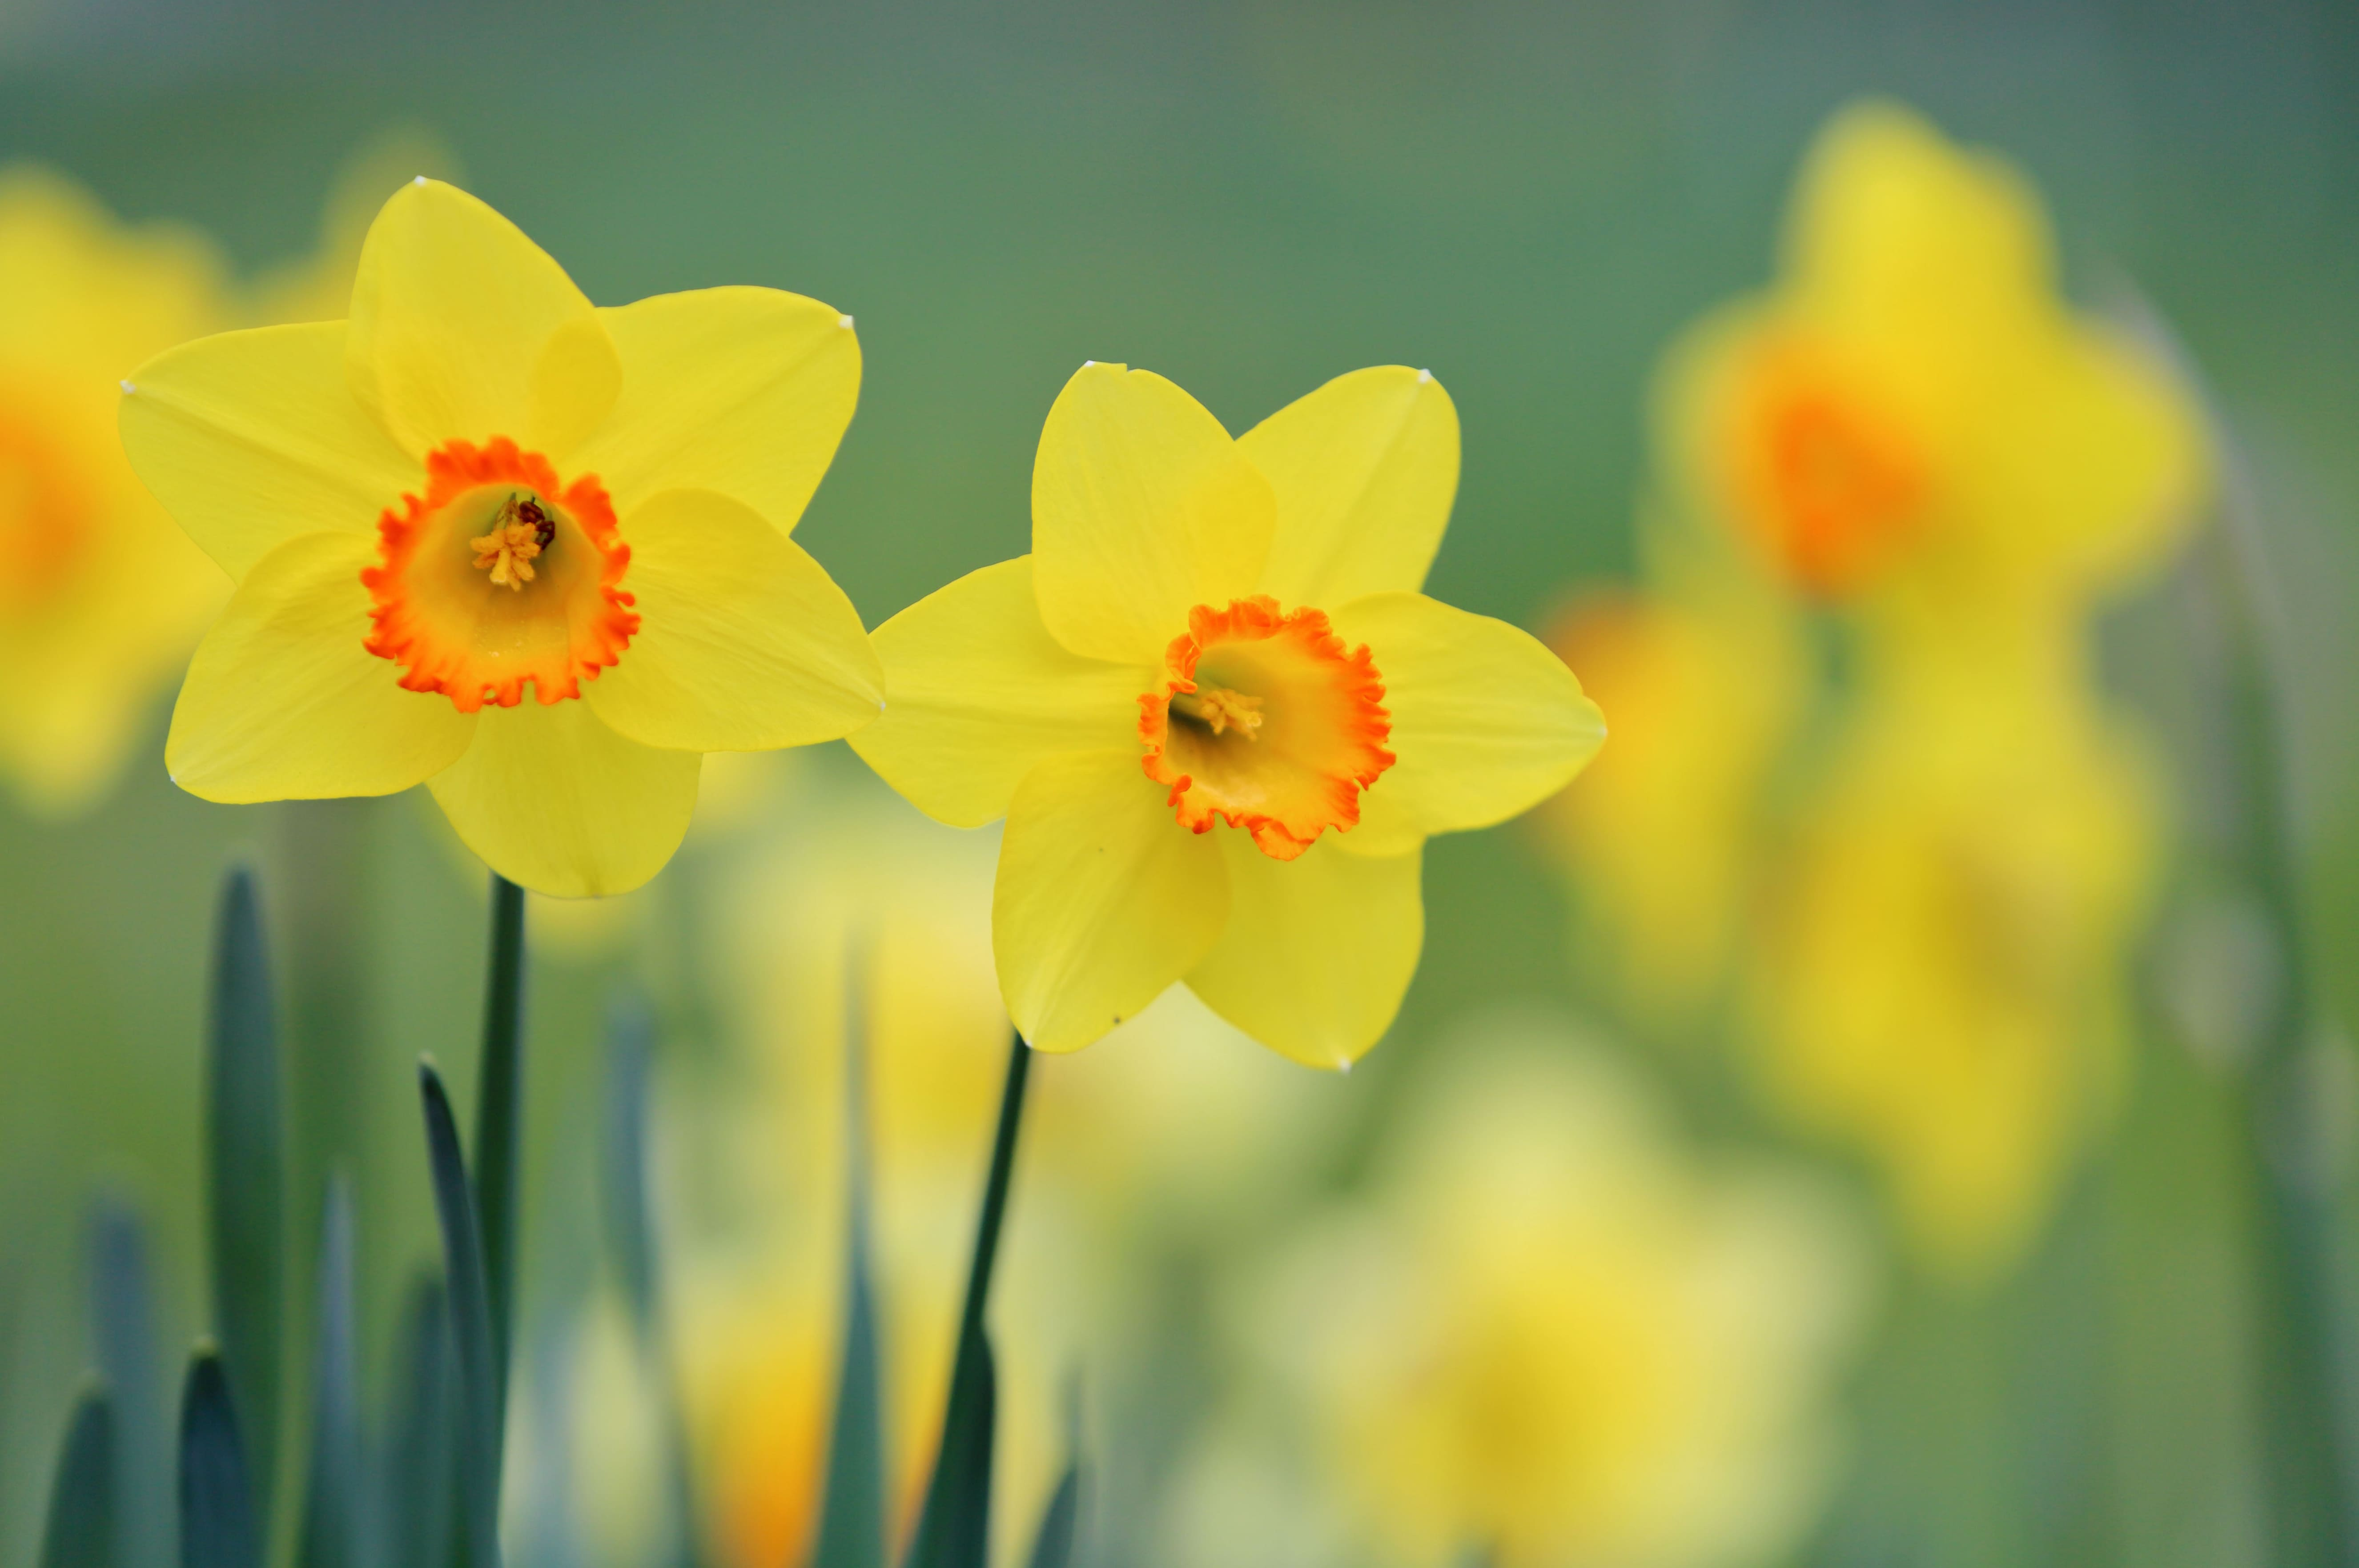 daffodils-photo-78